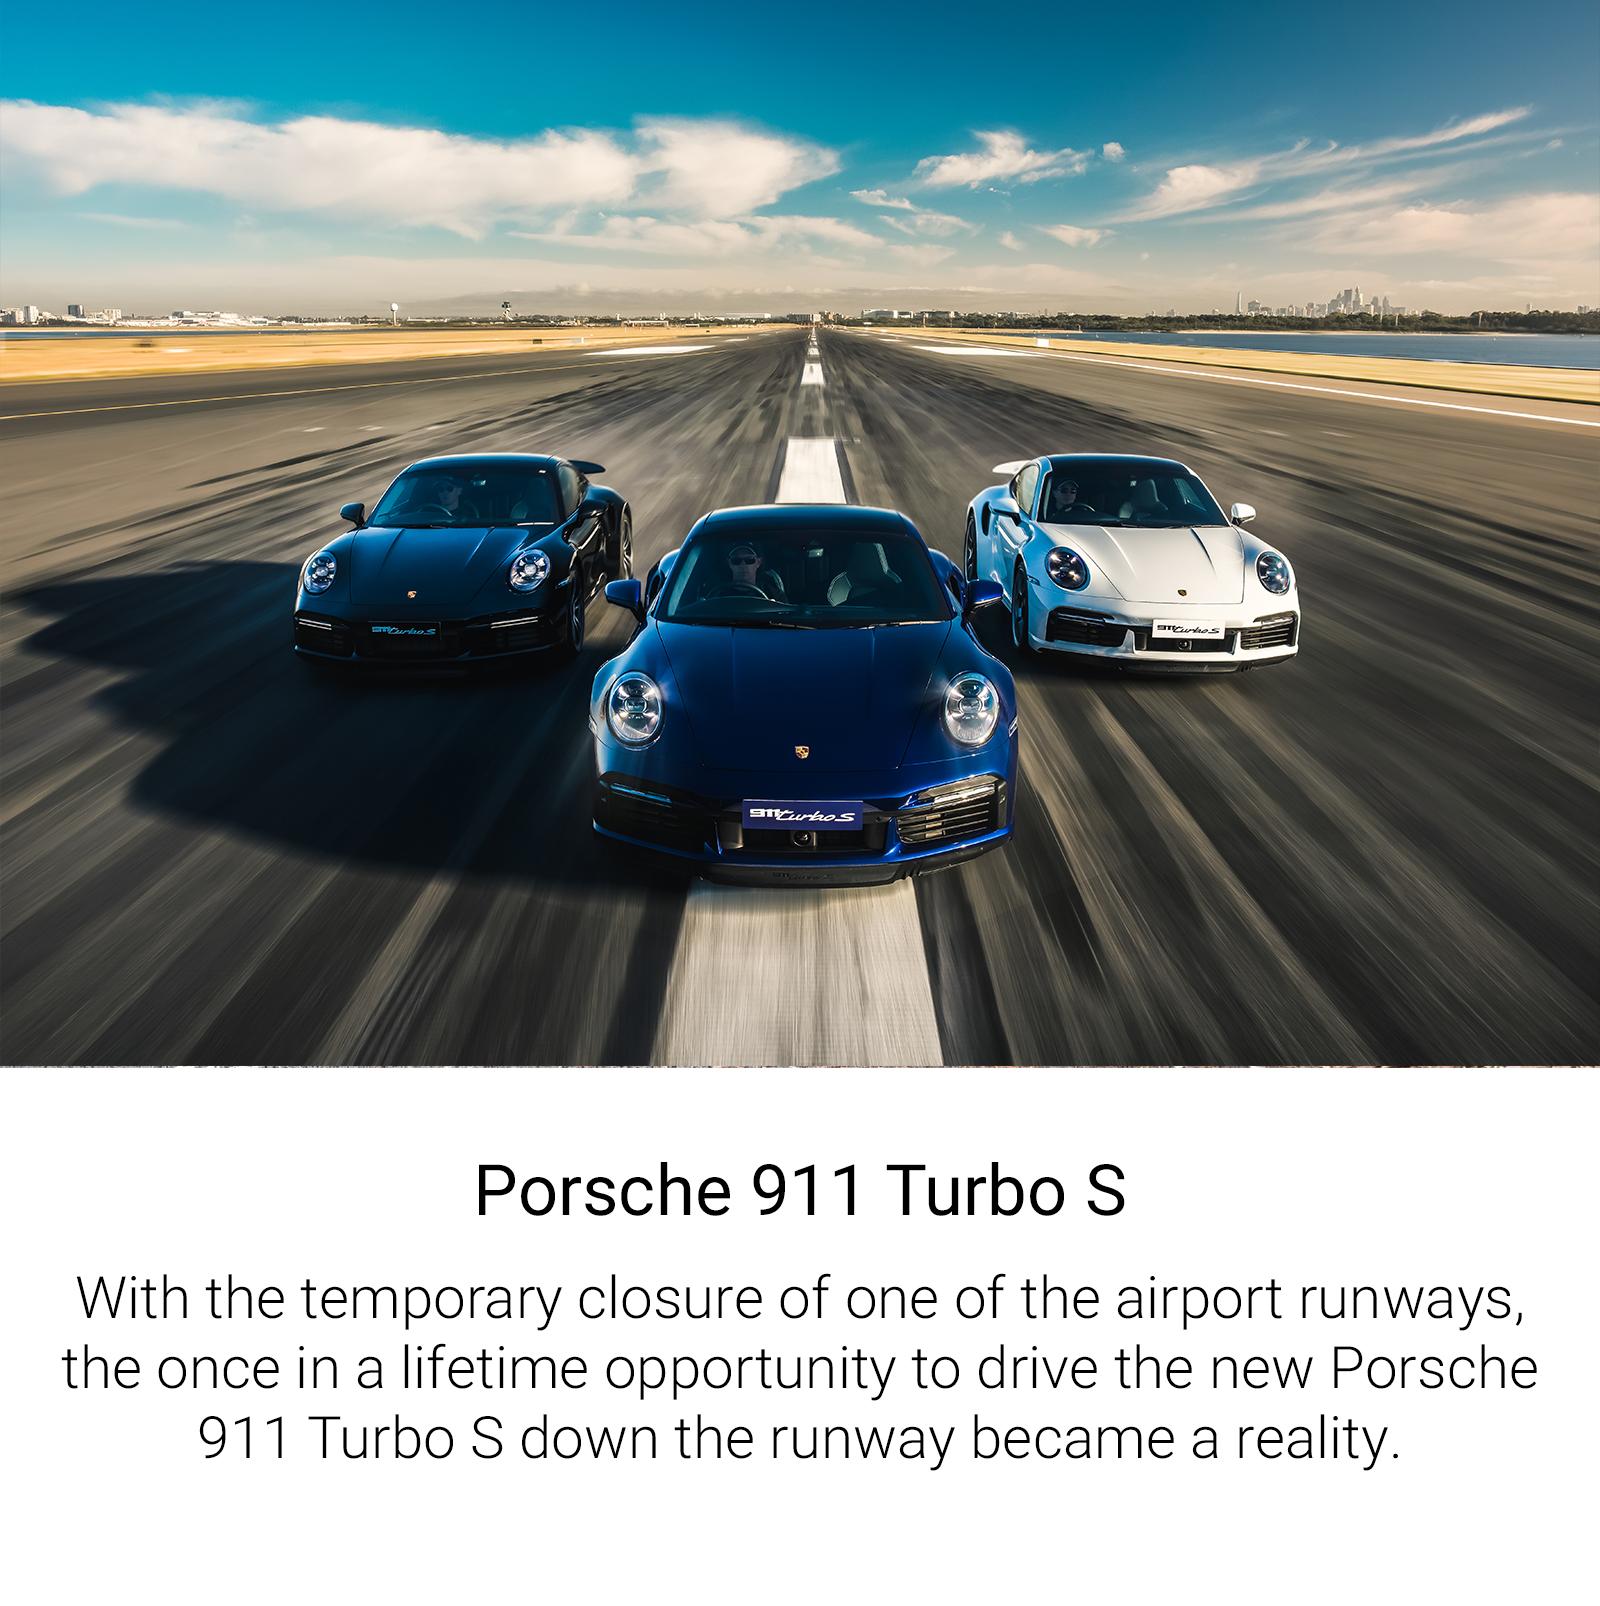 Porsche Turbo S Launch